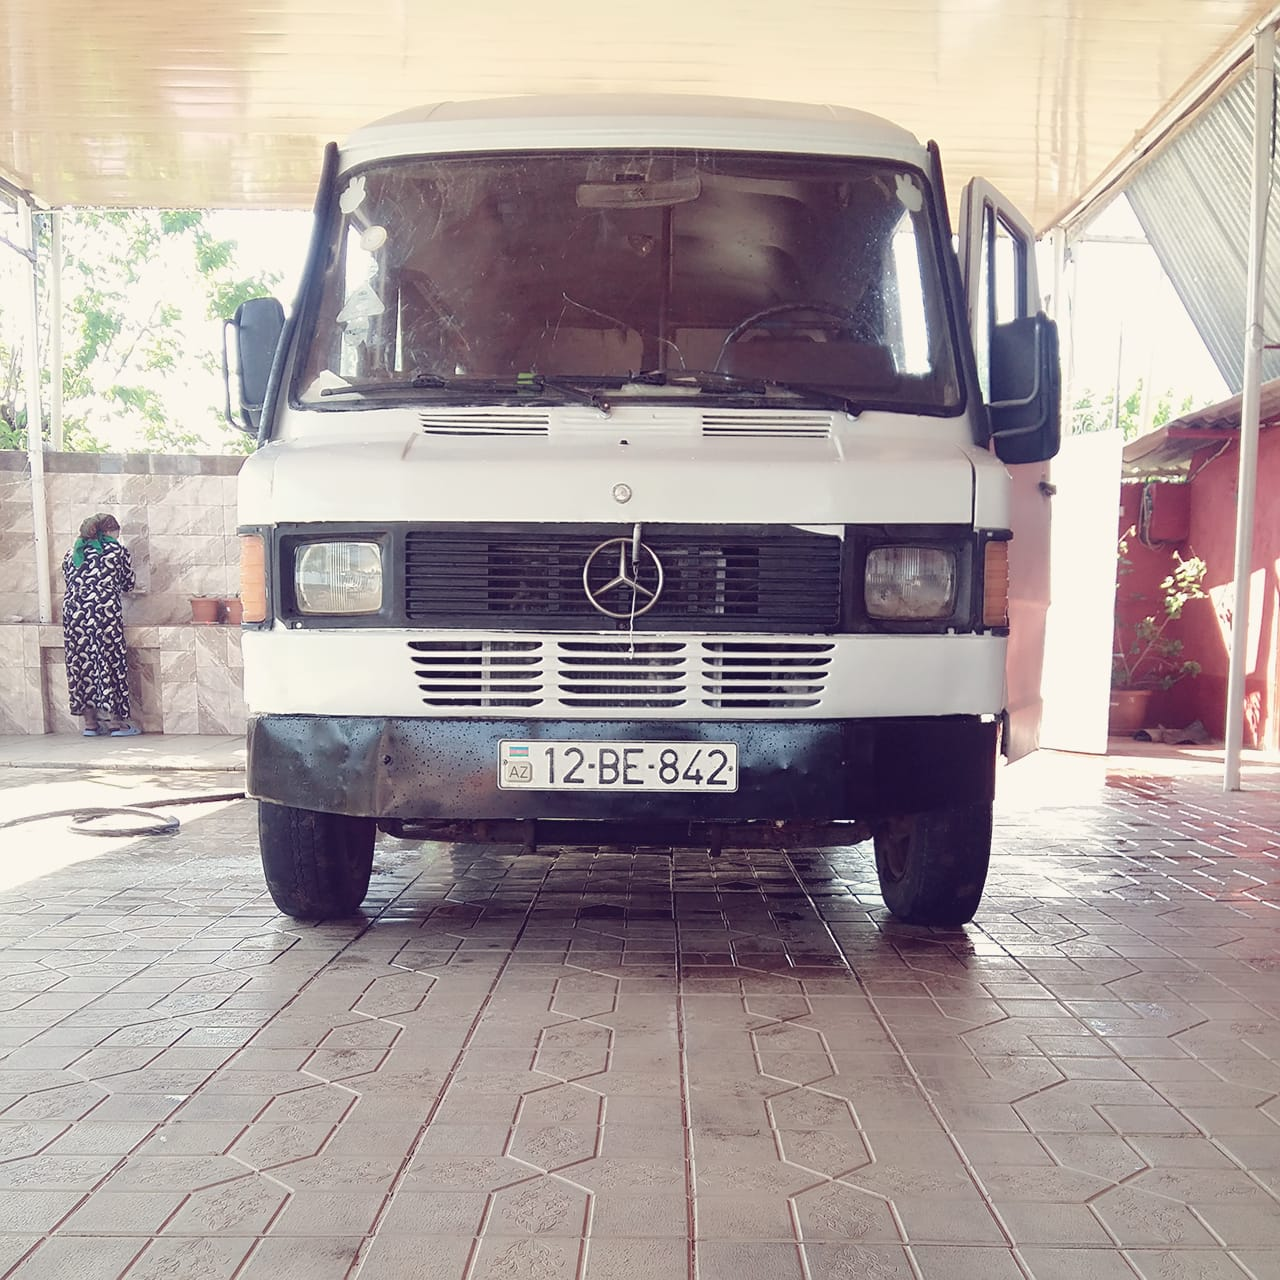 Mercedes-Benz T1 2.0(lt) 1993 Second hand  $6000